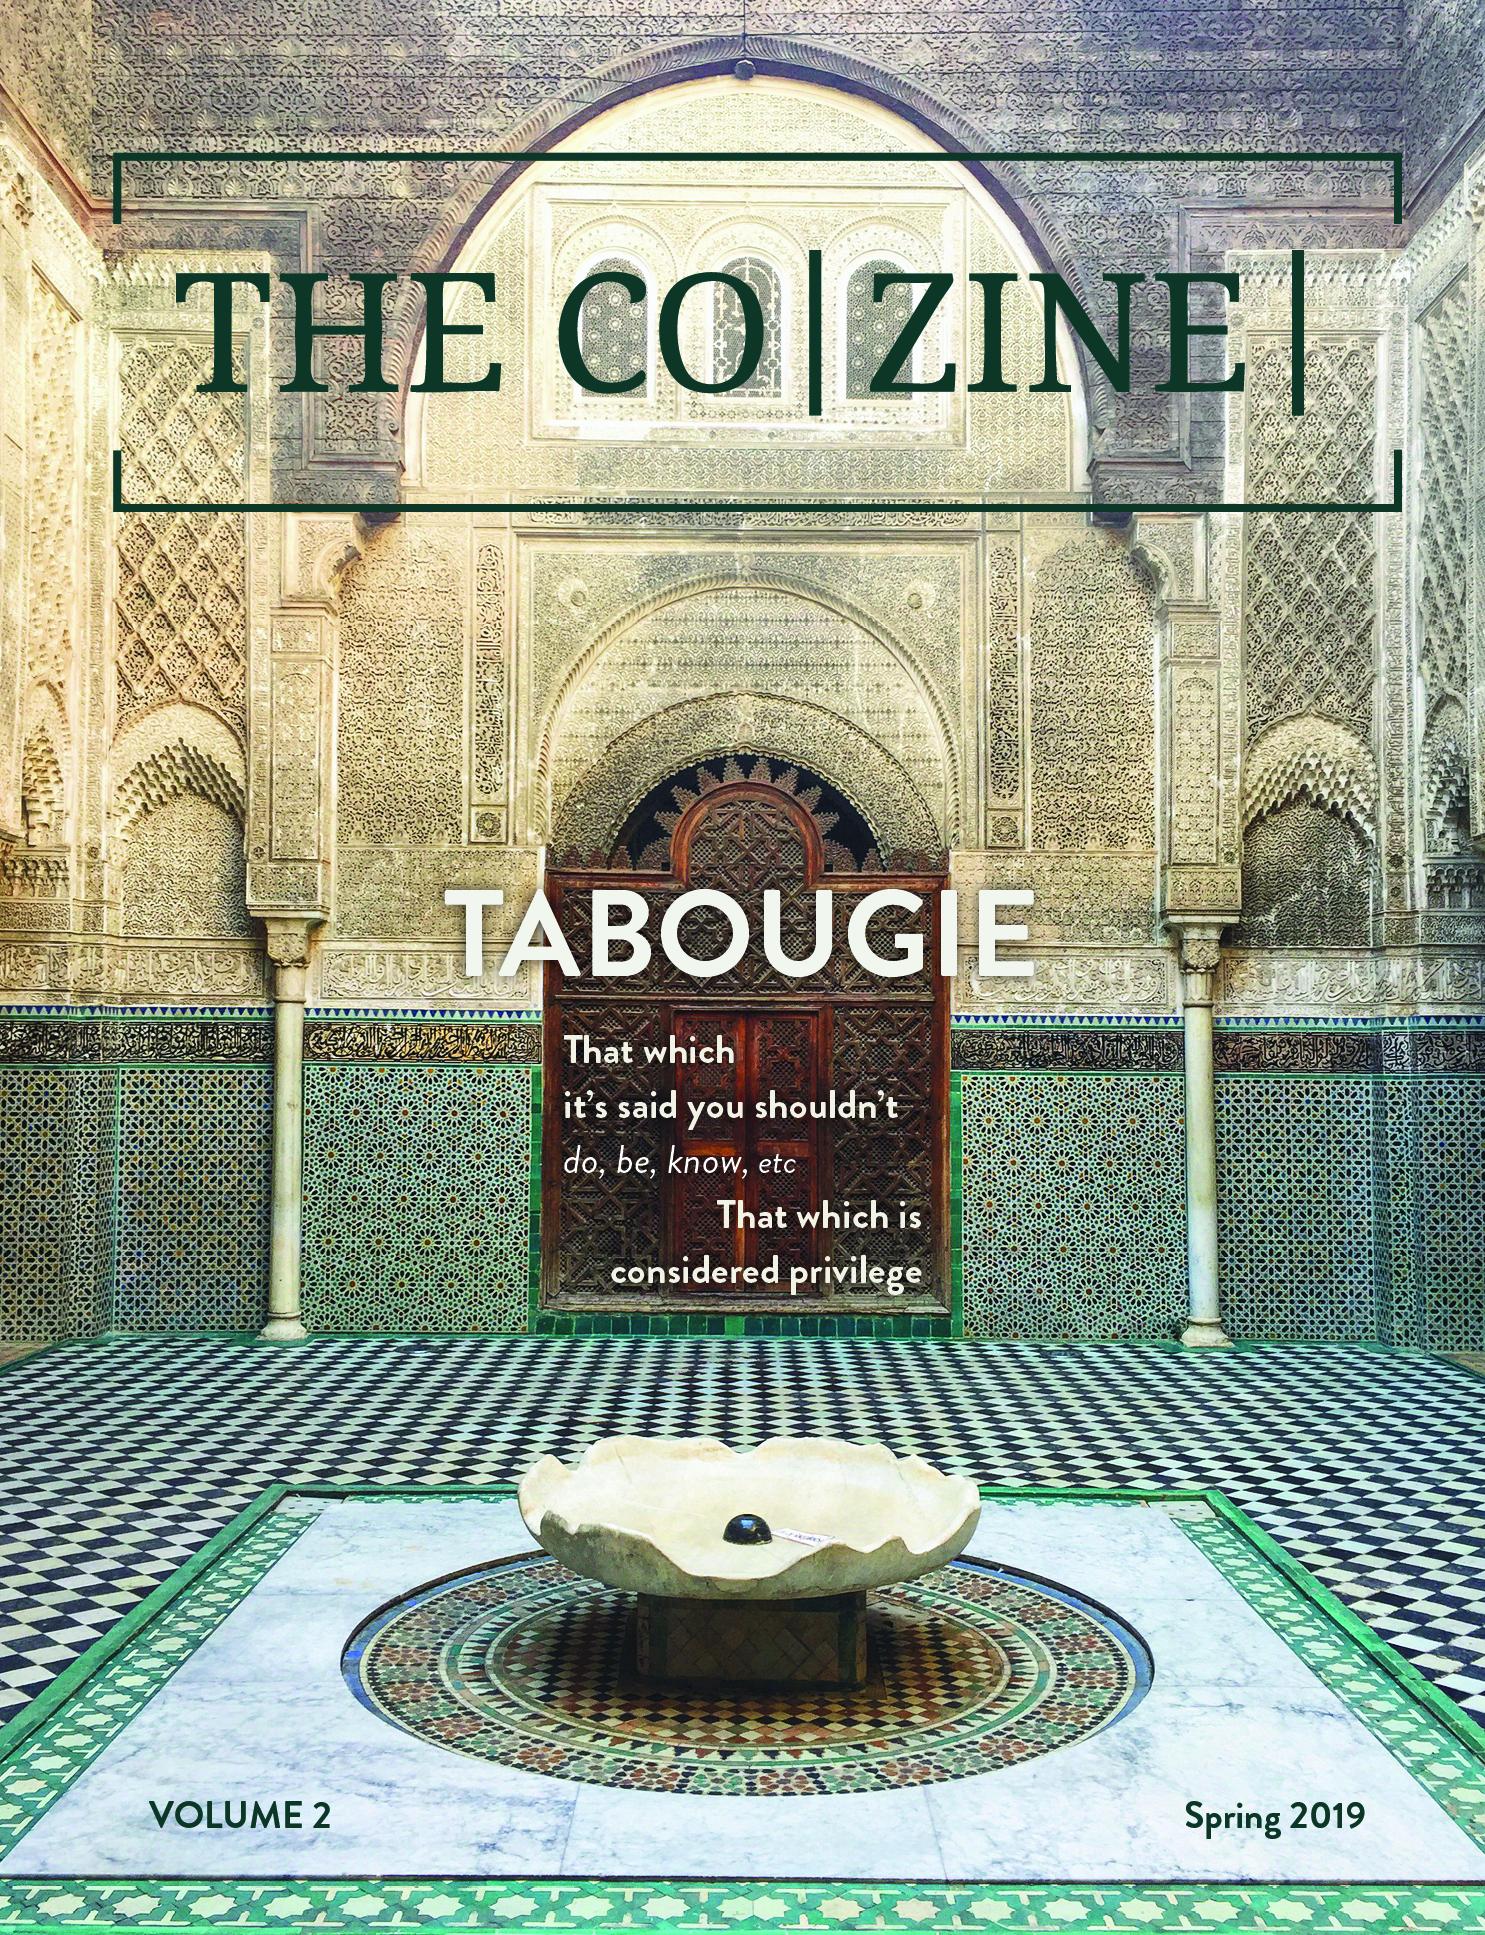 Co-Zine_Vol2_Cover_C.jpg